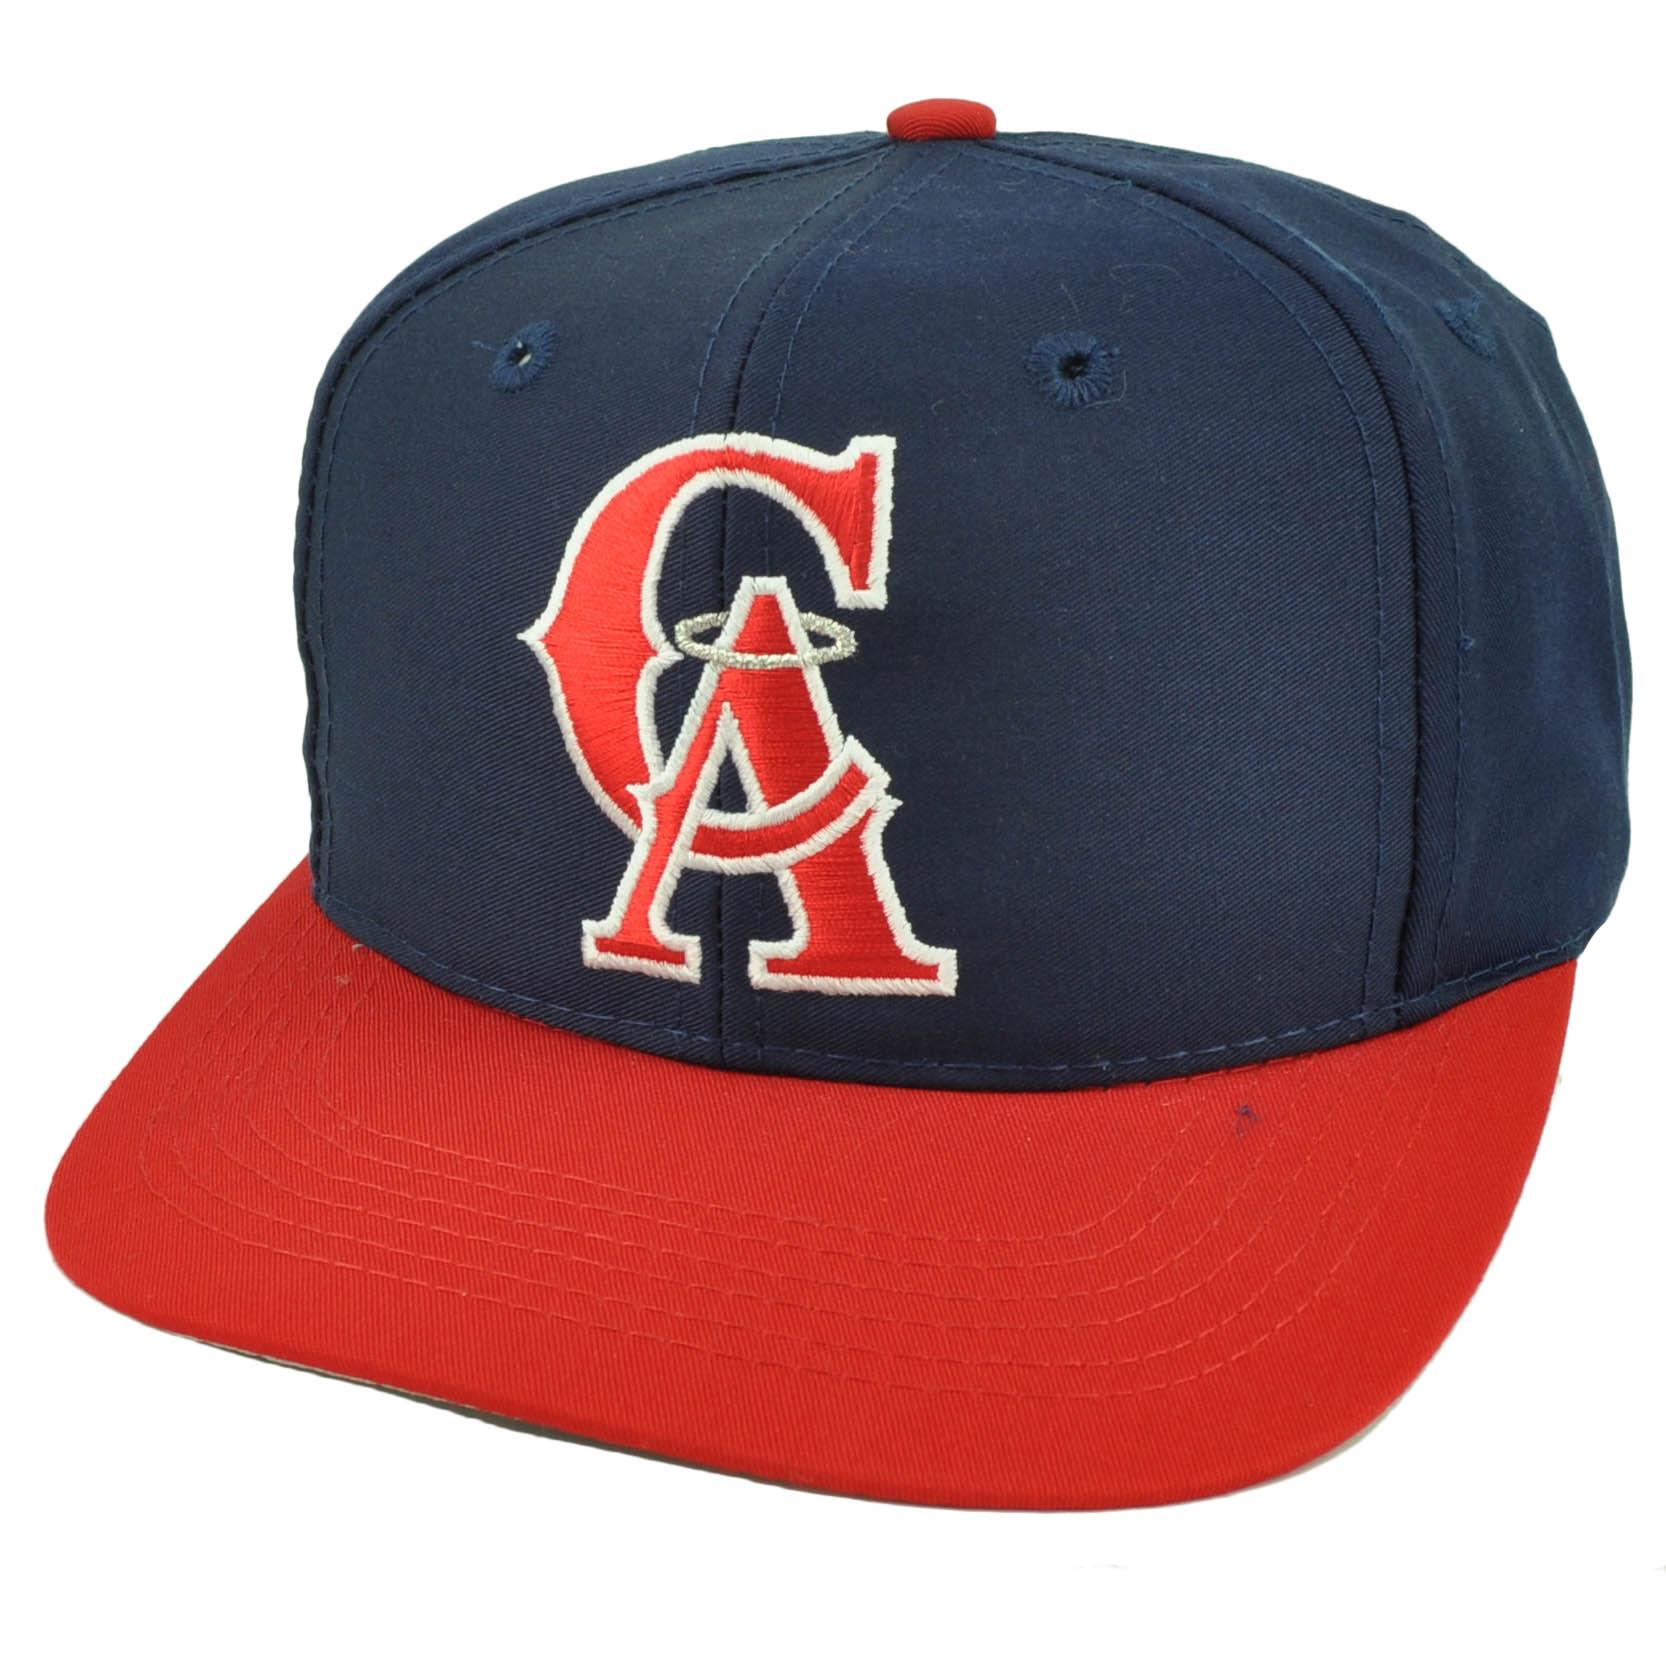 Los Angeles Angels Old School Logo Snapback Flat Bill Baseball Hat Cap Youth aaf5b08efb2